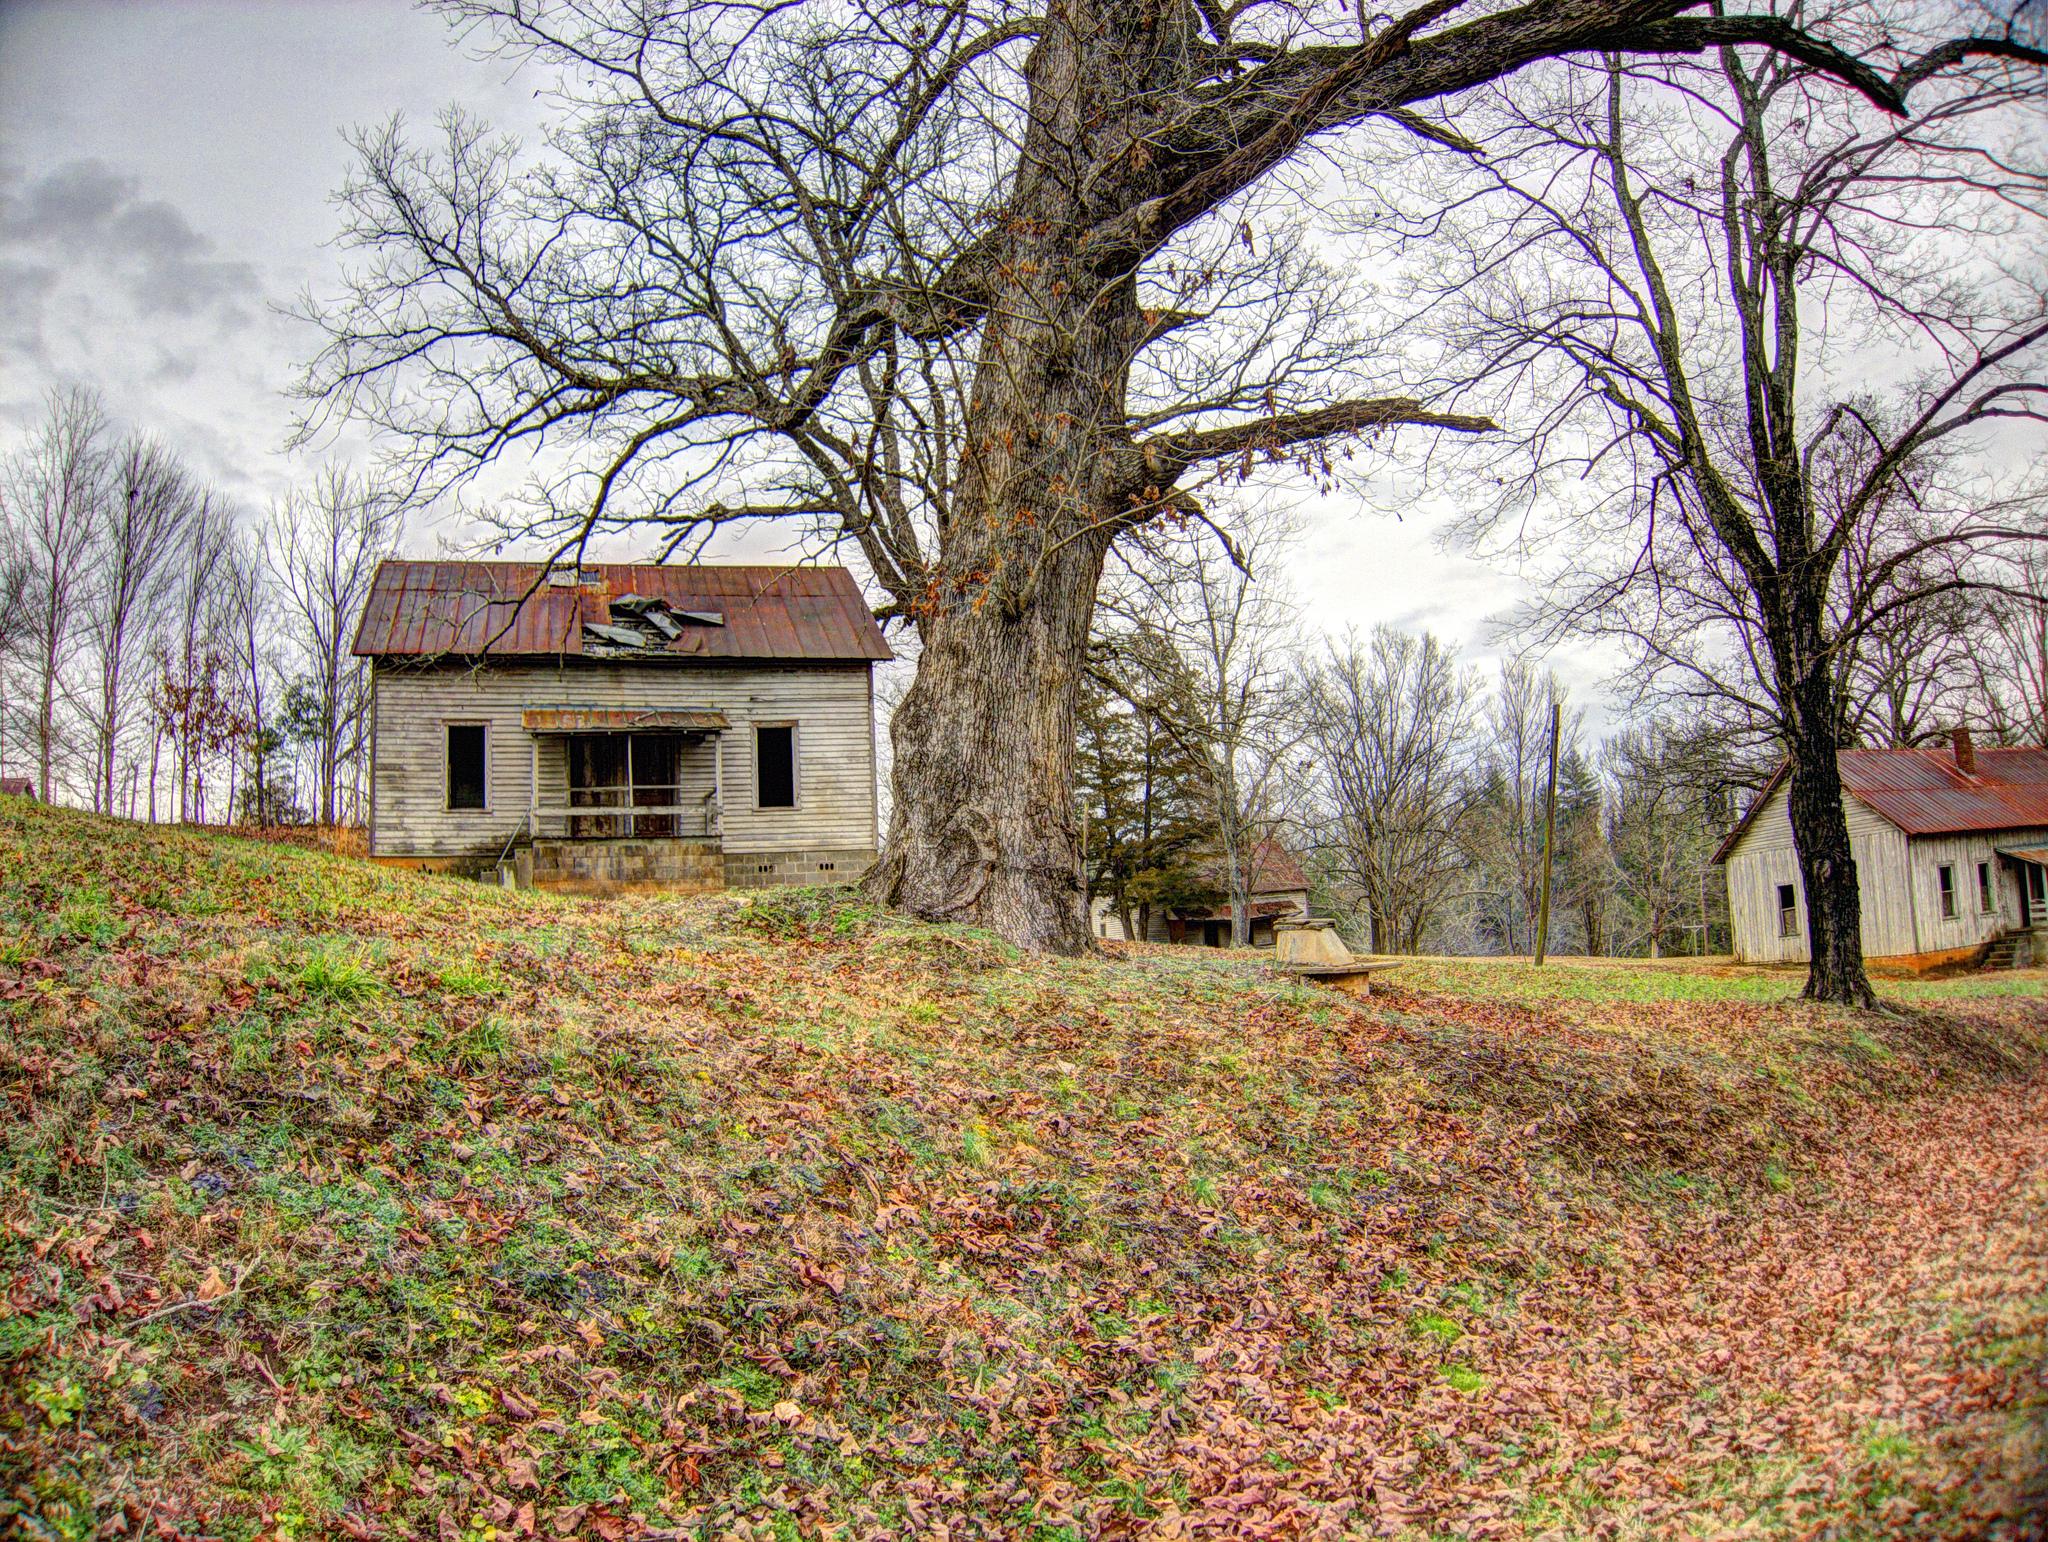 north carolina u0027s abandoned haunted henry river mill village is